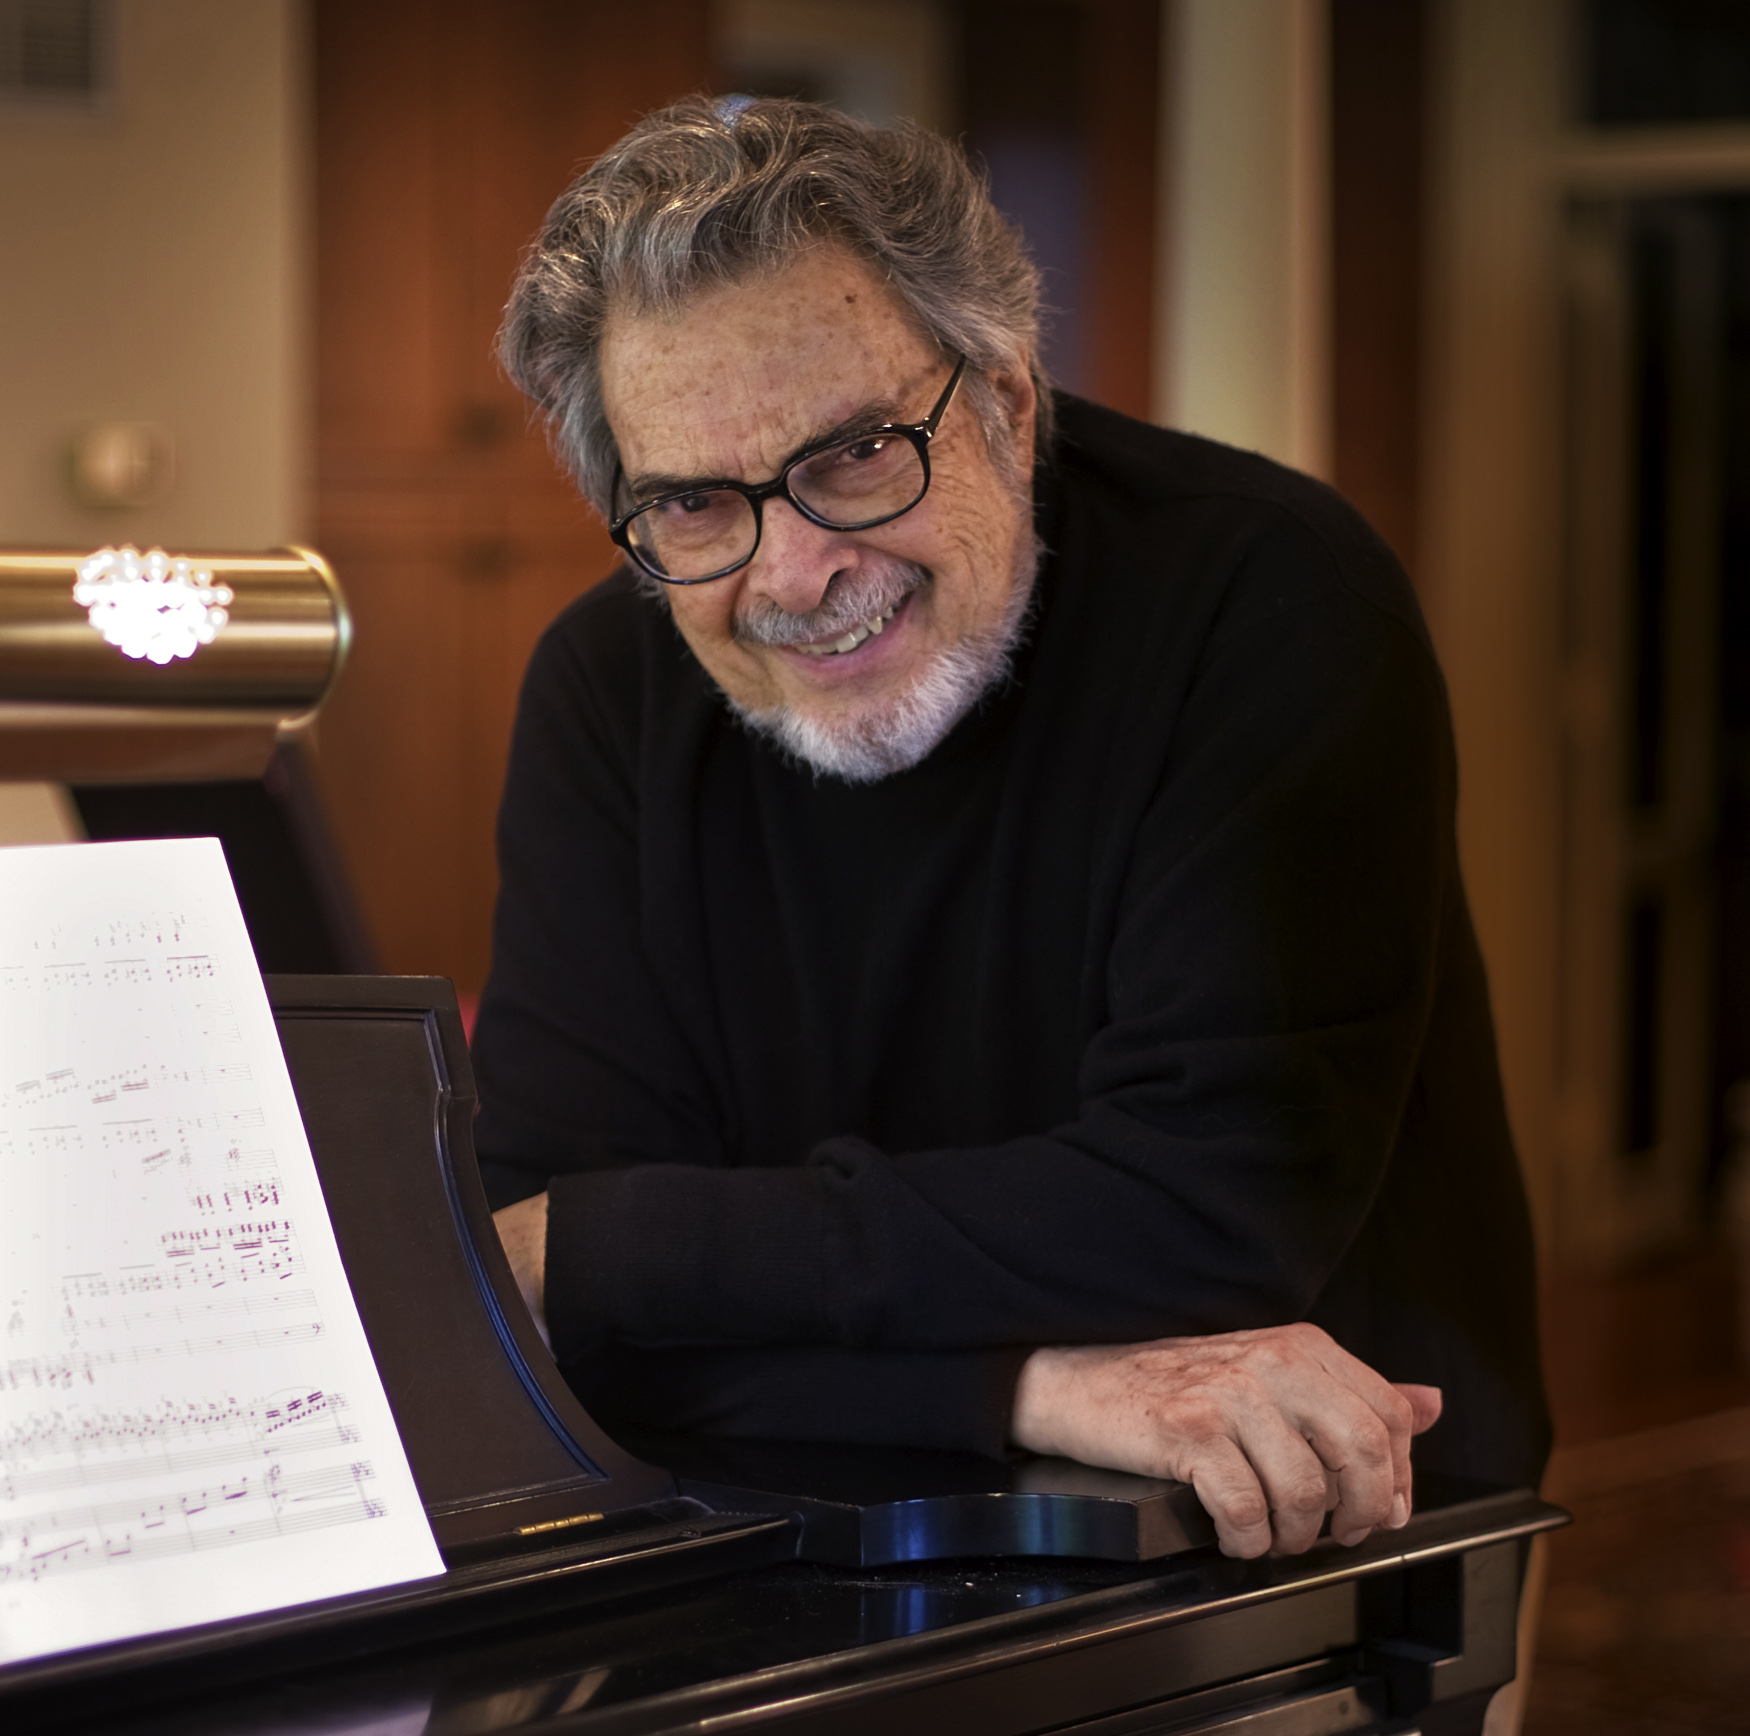 Pianist Leon Fleisher marks 90th birthday with a buoyant spirit